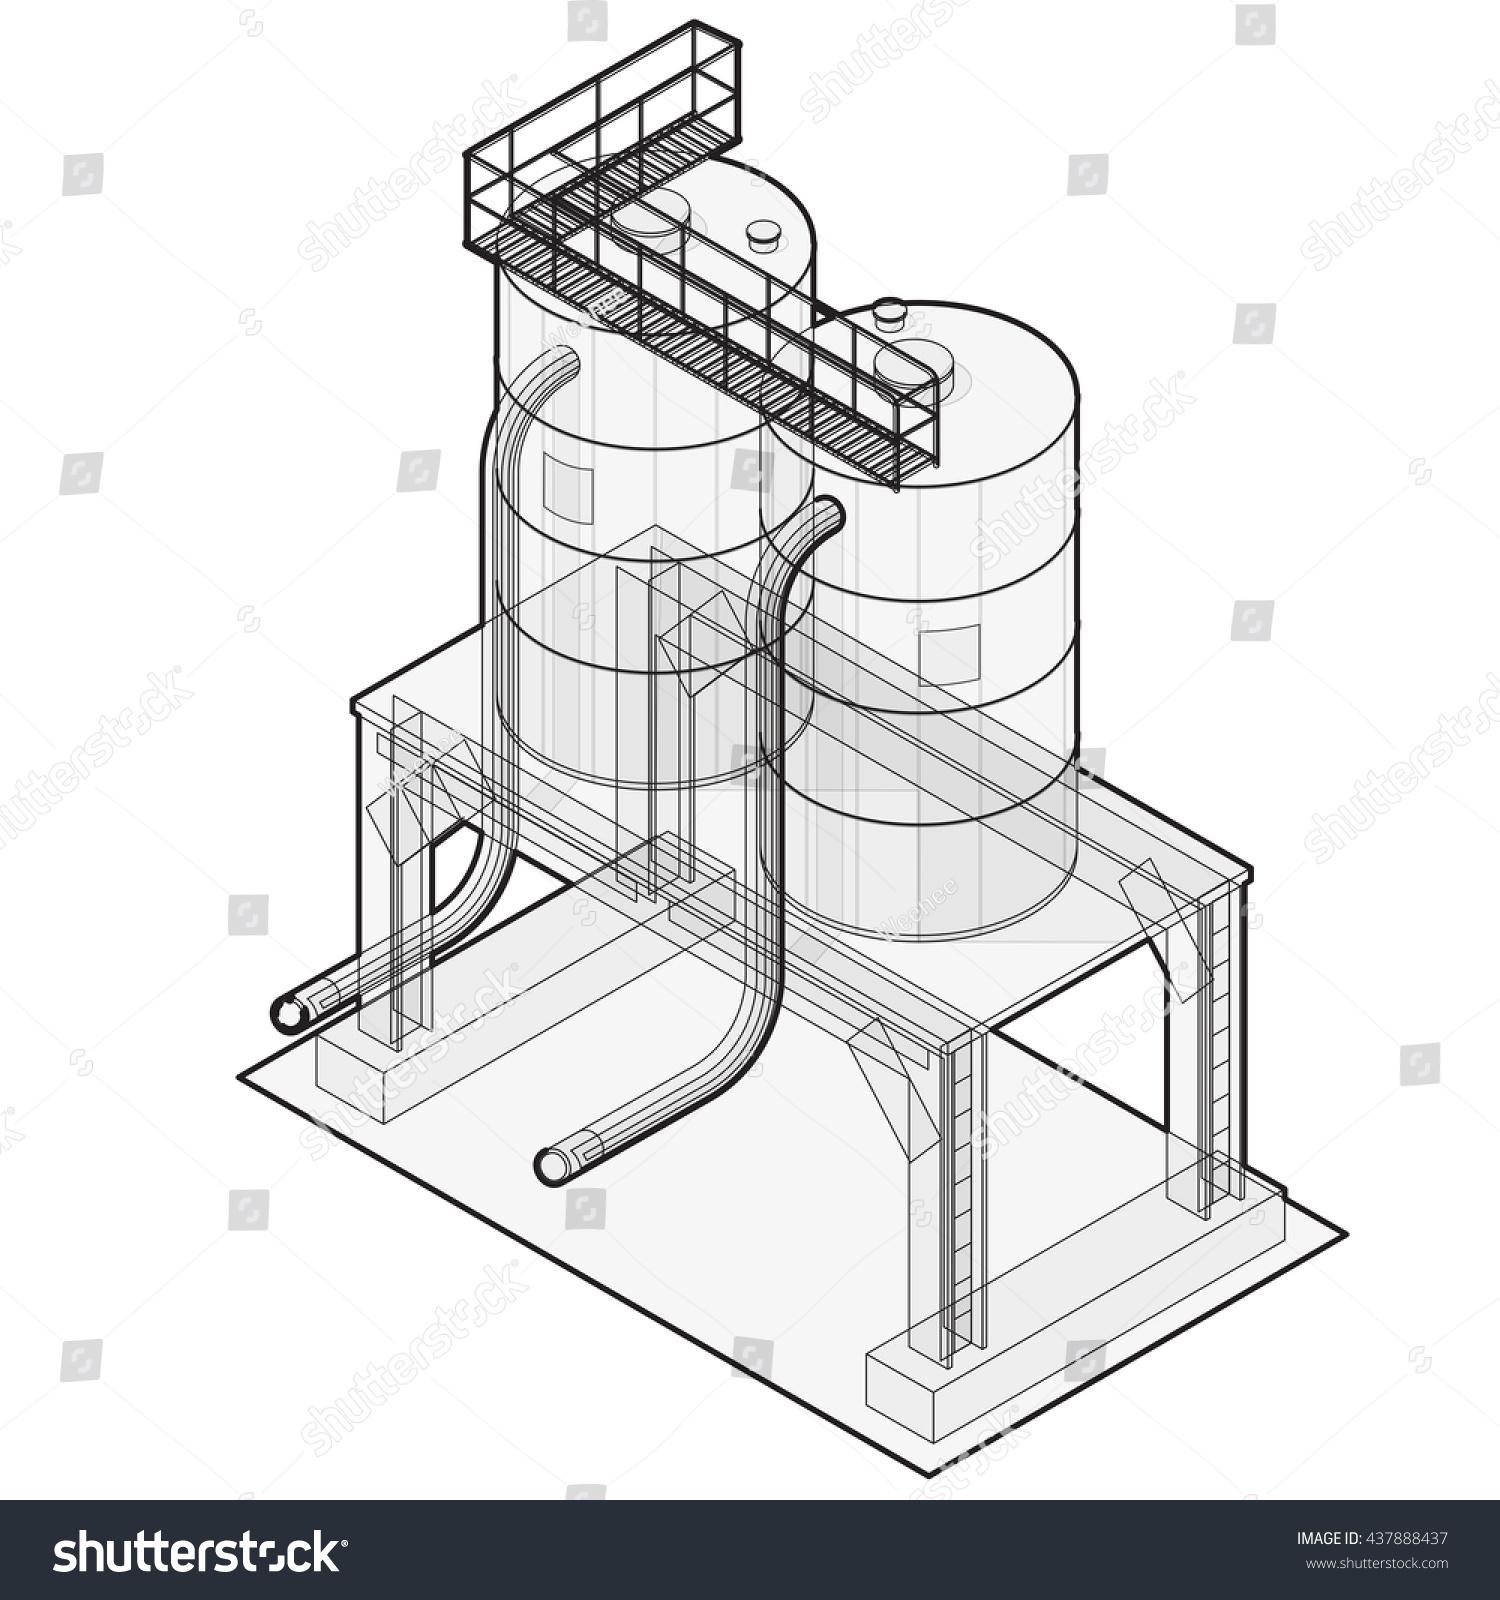 fraser johnston furnace wiring diagram